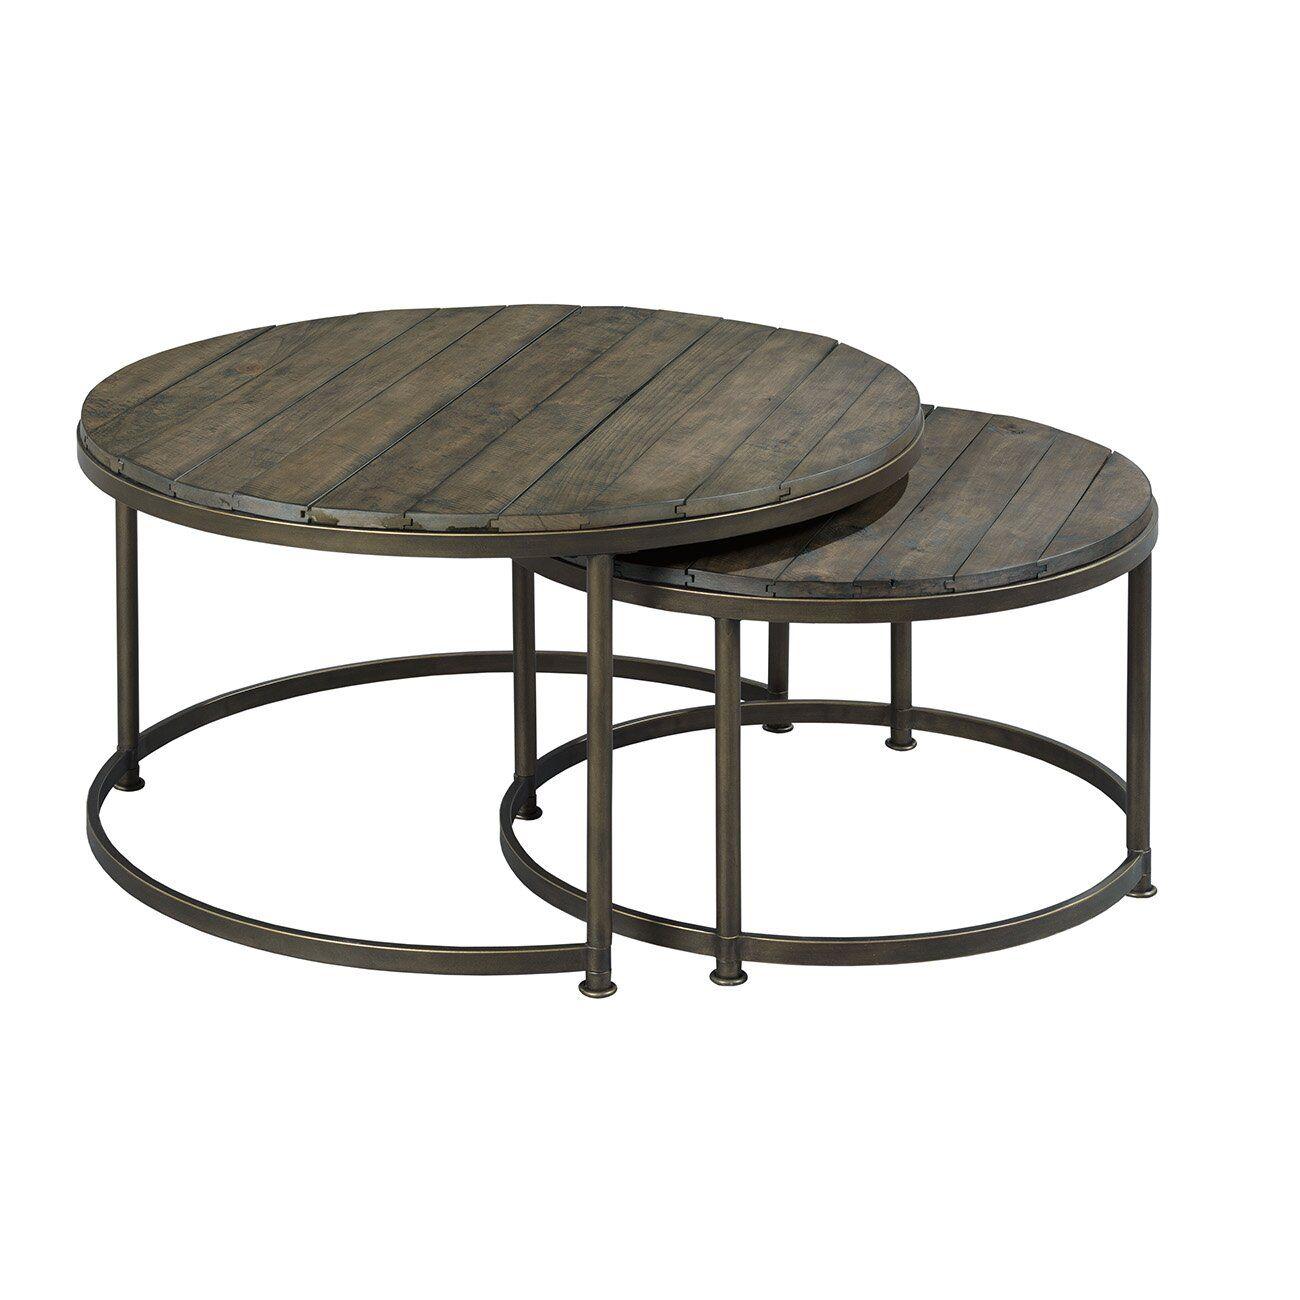 Top Wayfair Coffee Table Sets Coffee Table Design Round Coffee Table Diy Coffee Table [ 1300 x 1300 Pixel ]